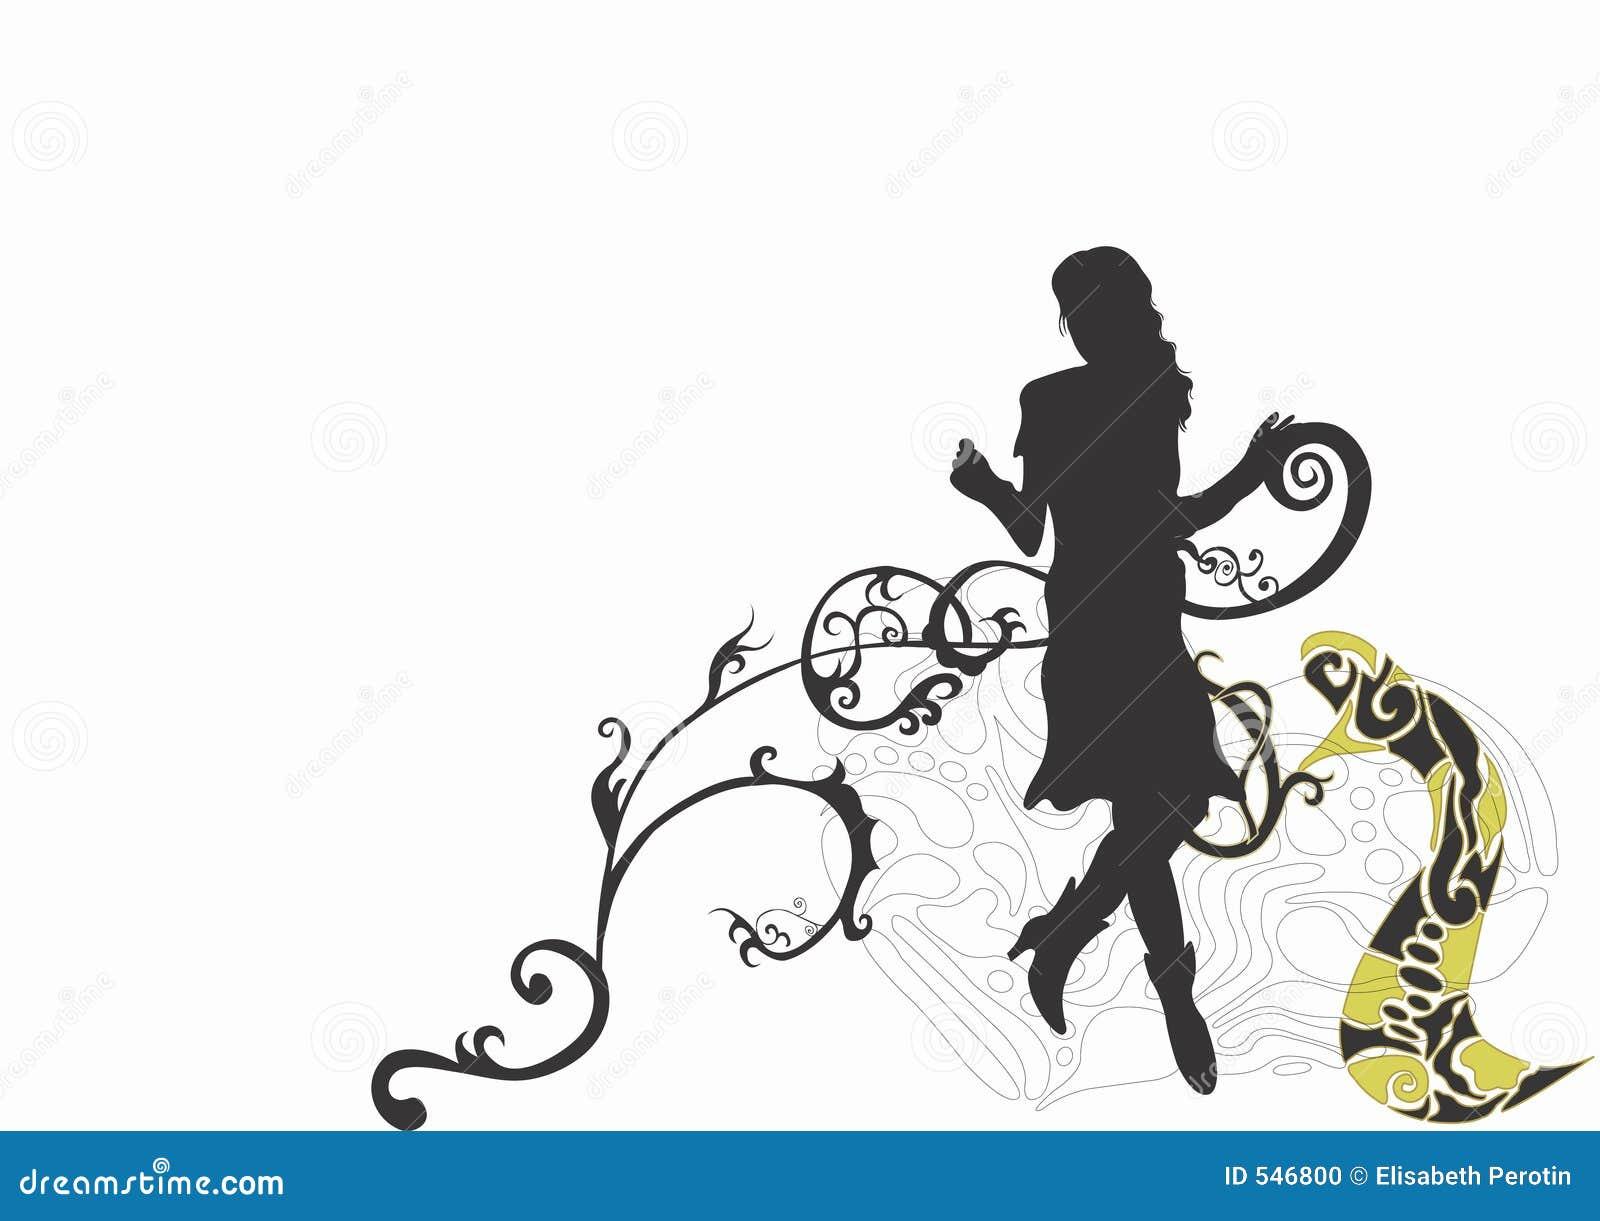 Download 剪影 库存例证. 插画 包括有 妇女, 人员, 模式, 装饰品, 滚动, 设计, 女性, 艺术性, 例证, 装饰 - 546800